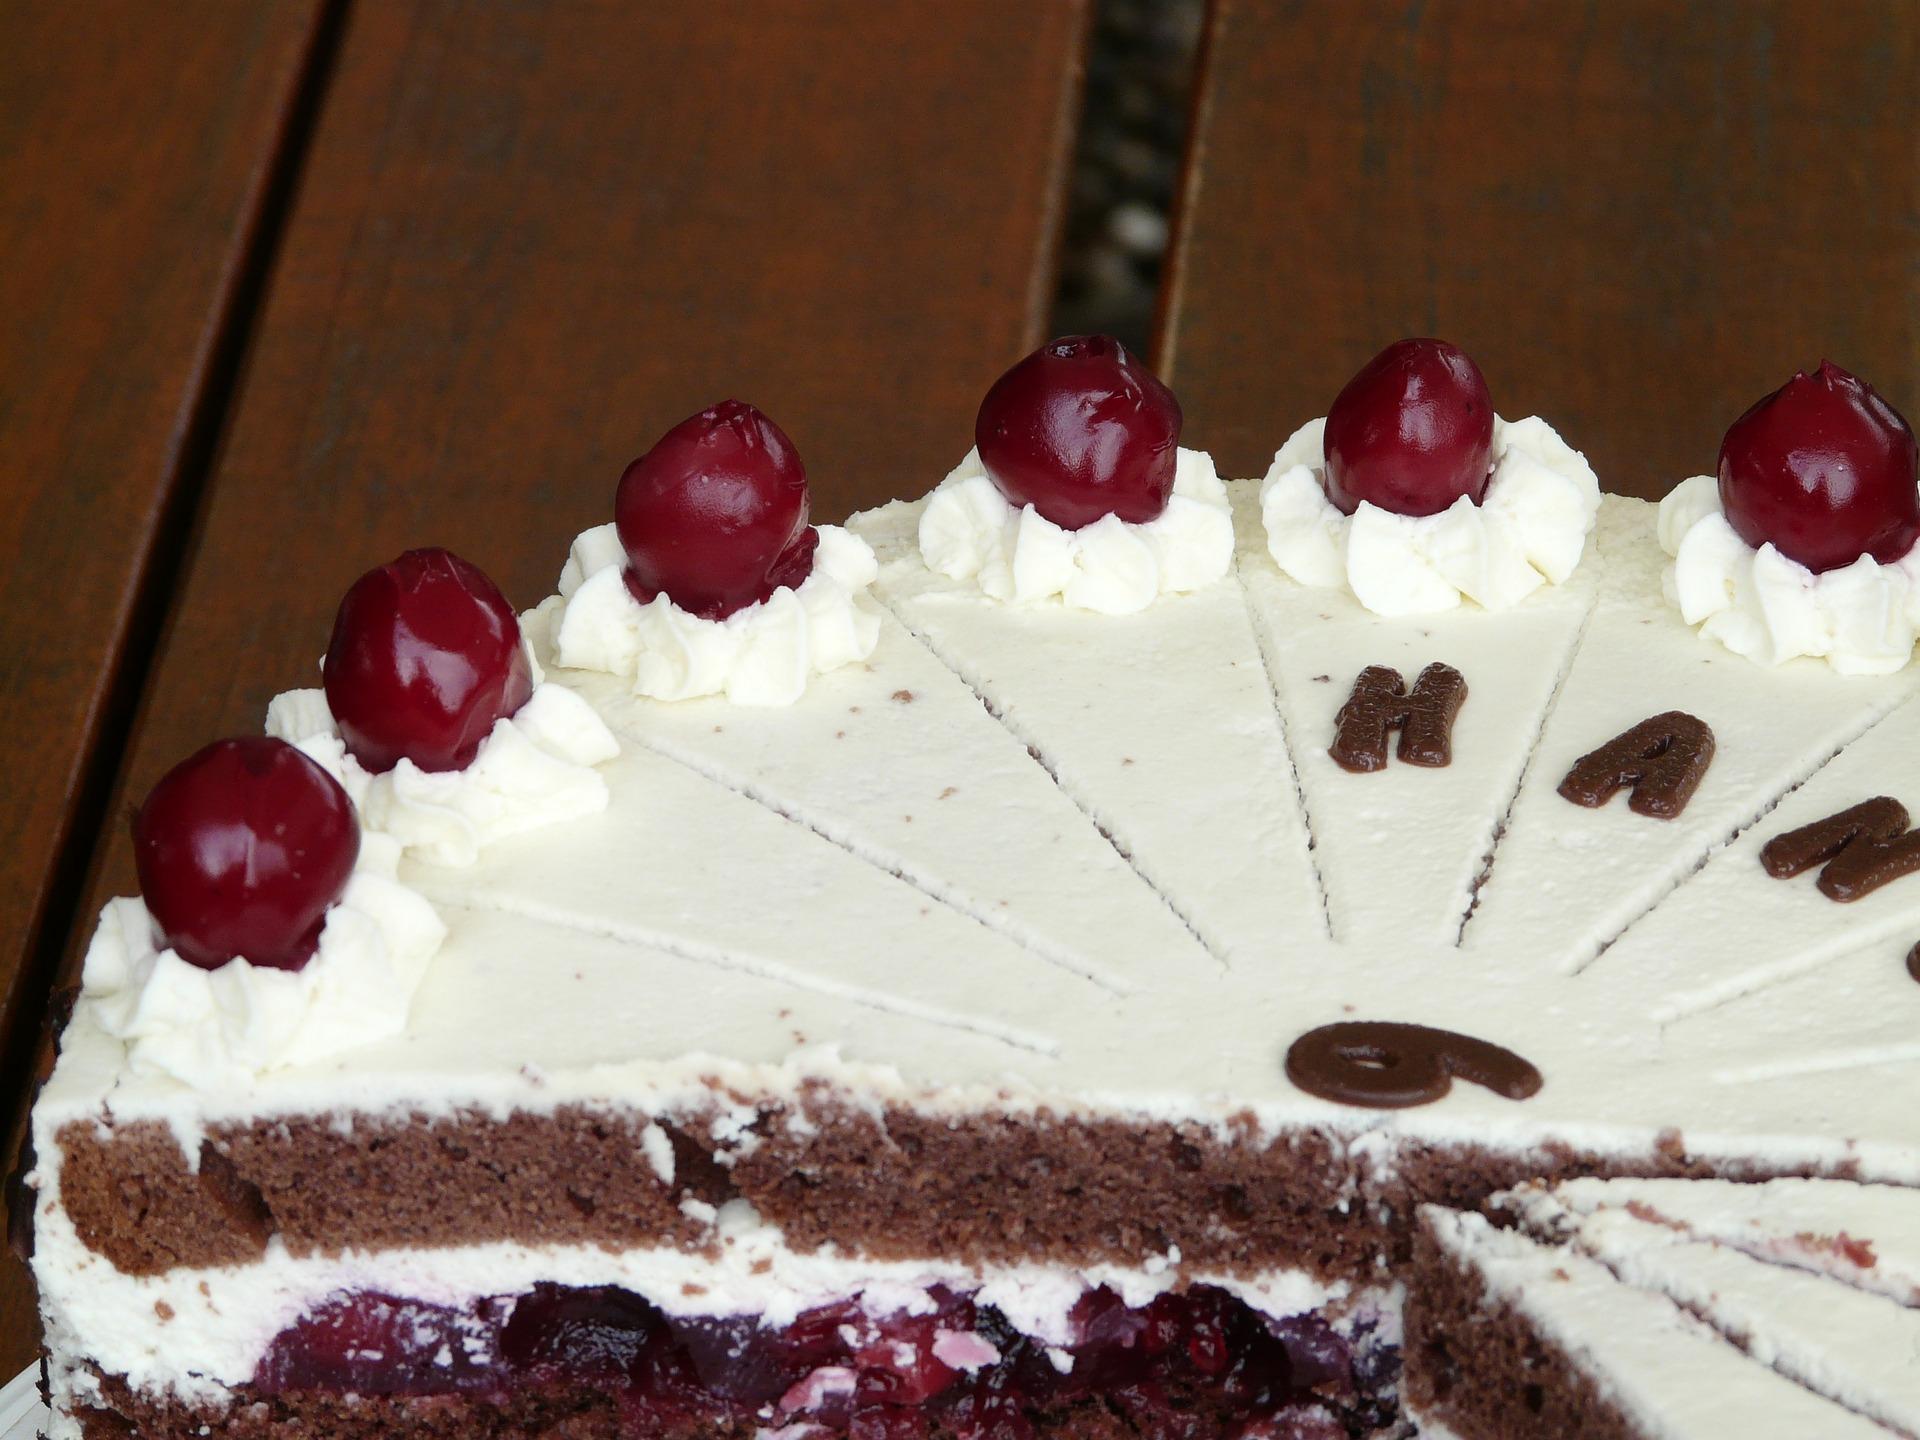 black-forest-cake-58677_1920